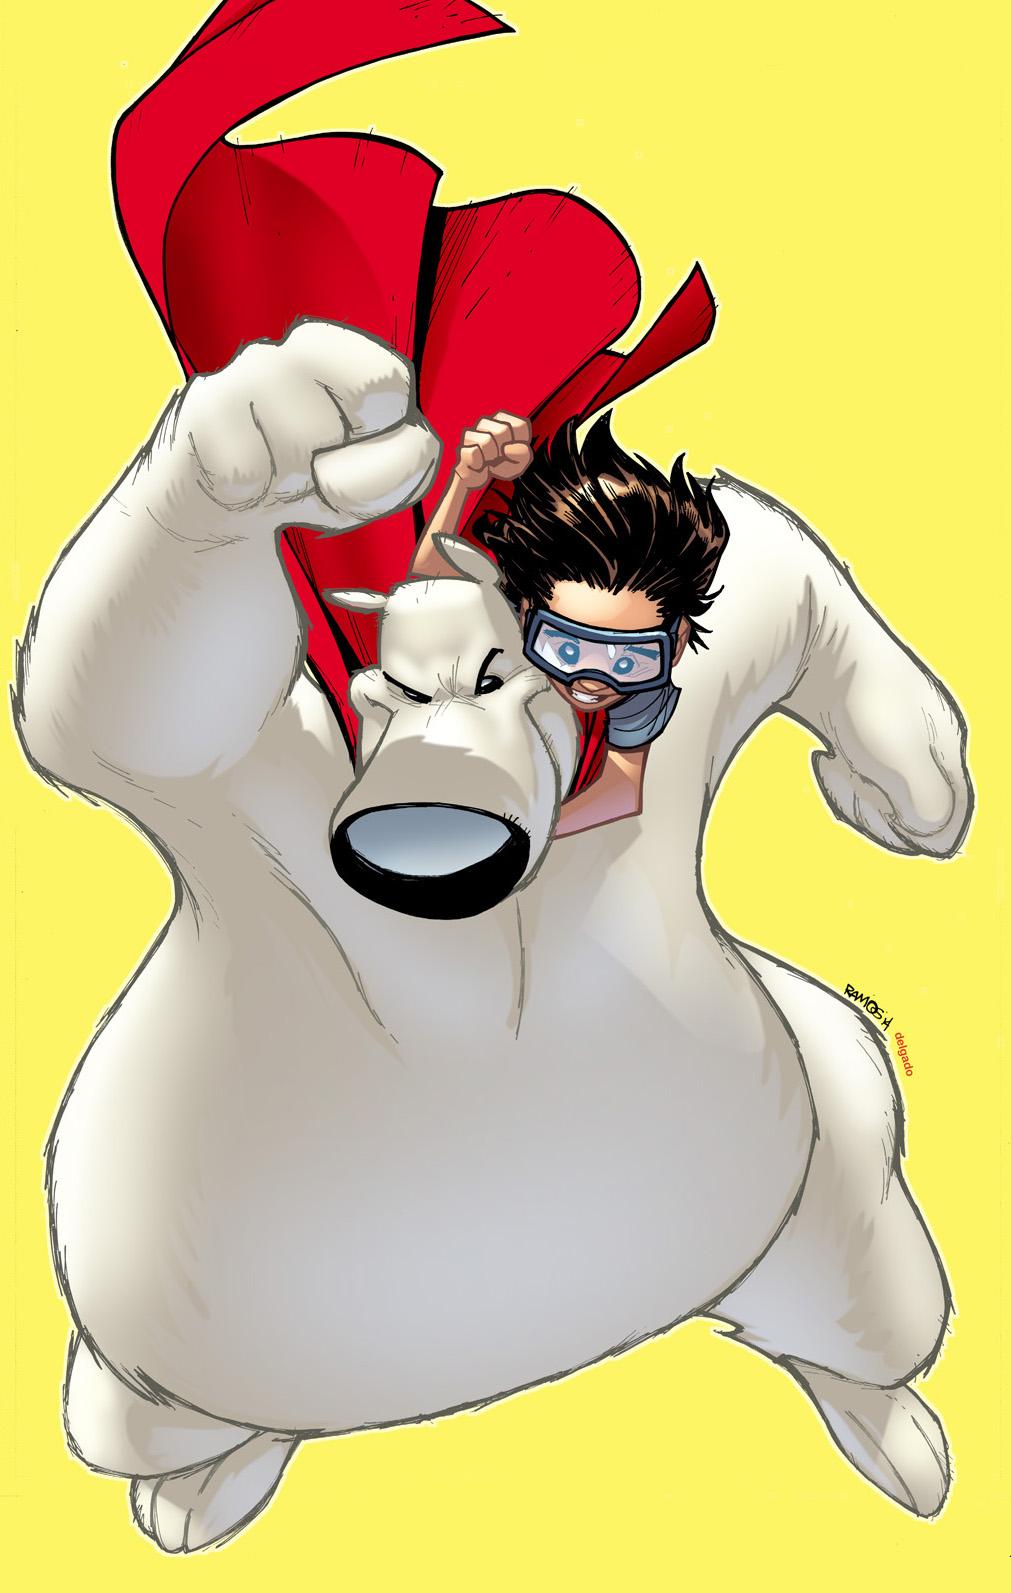 Herobear and the Kid: Saving Time Cover B